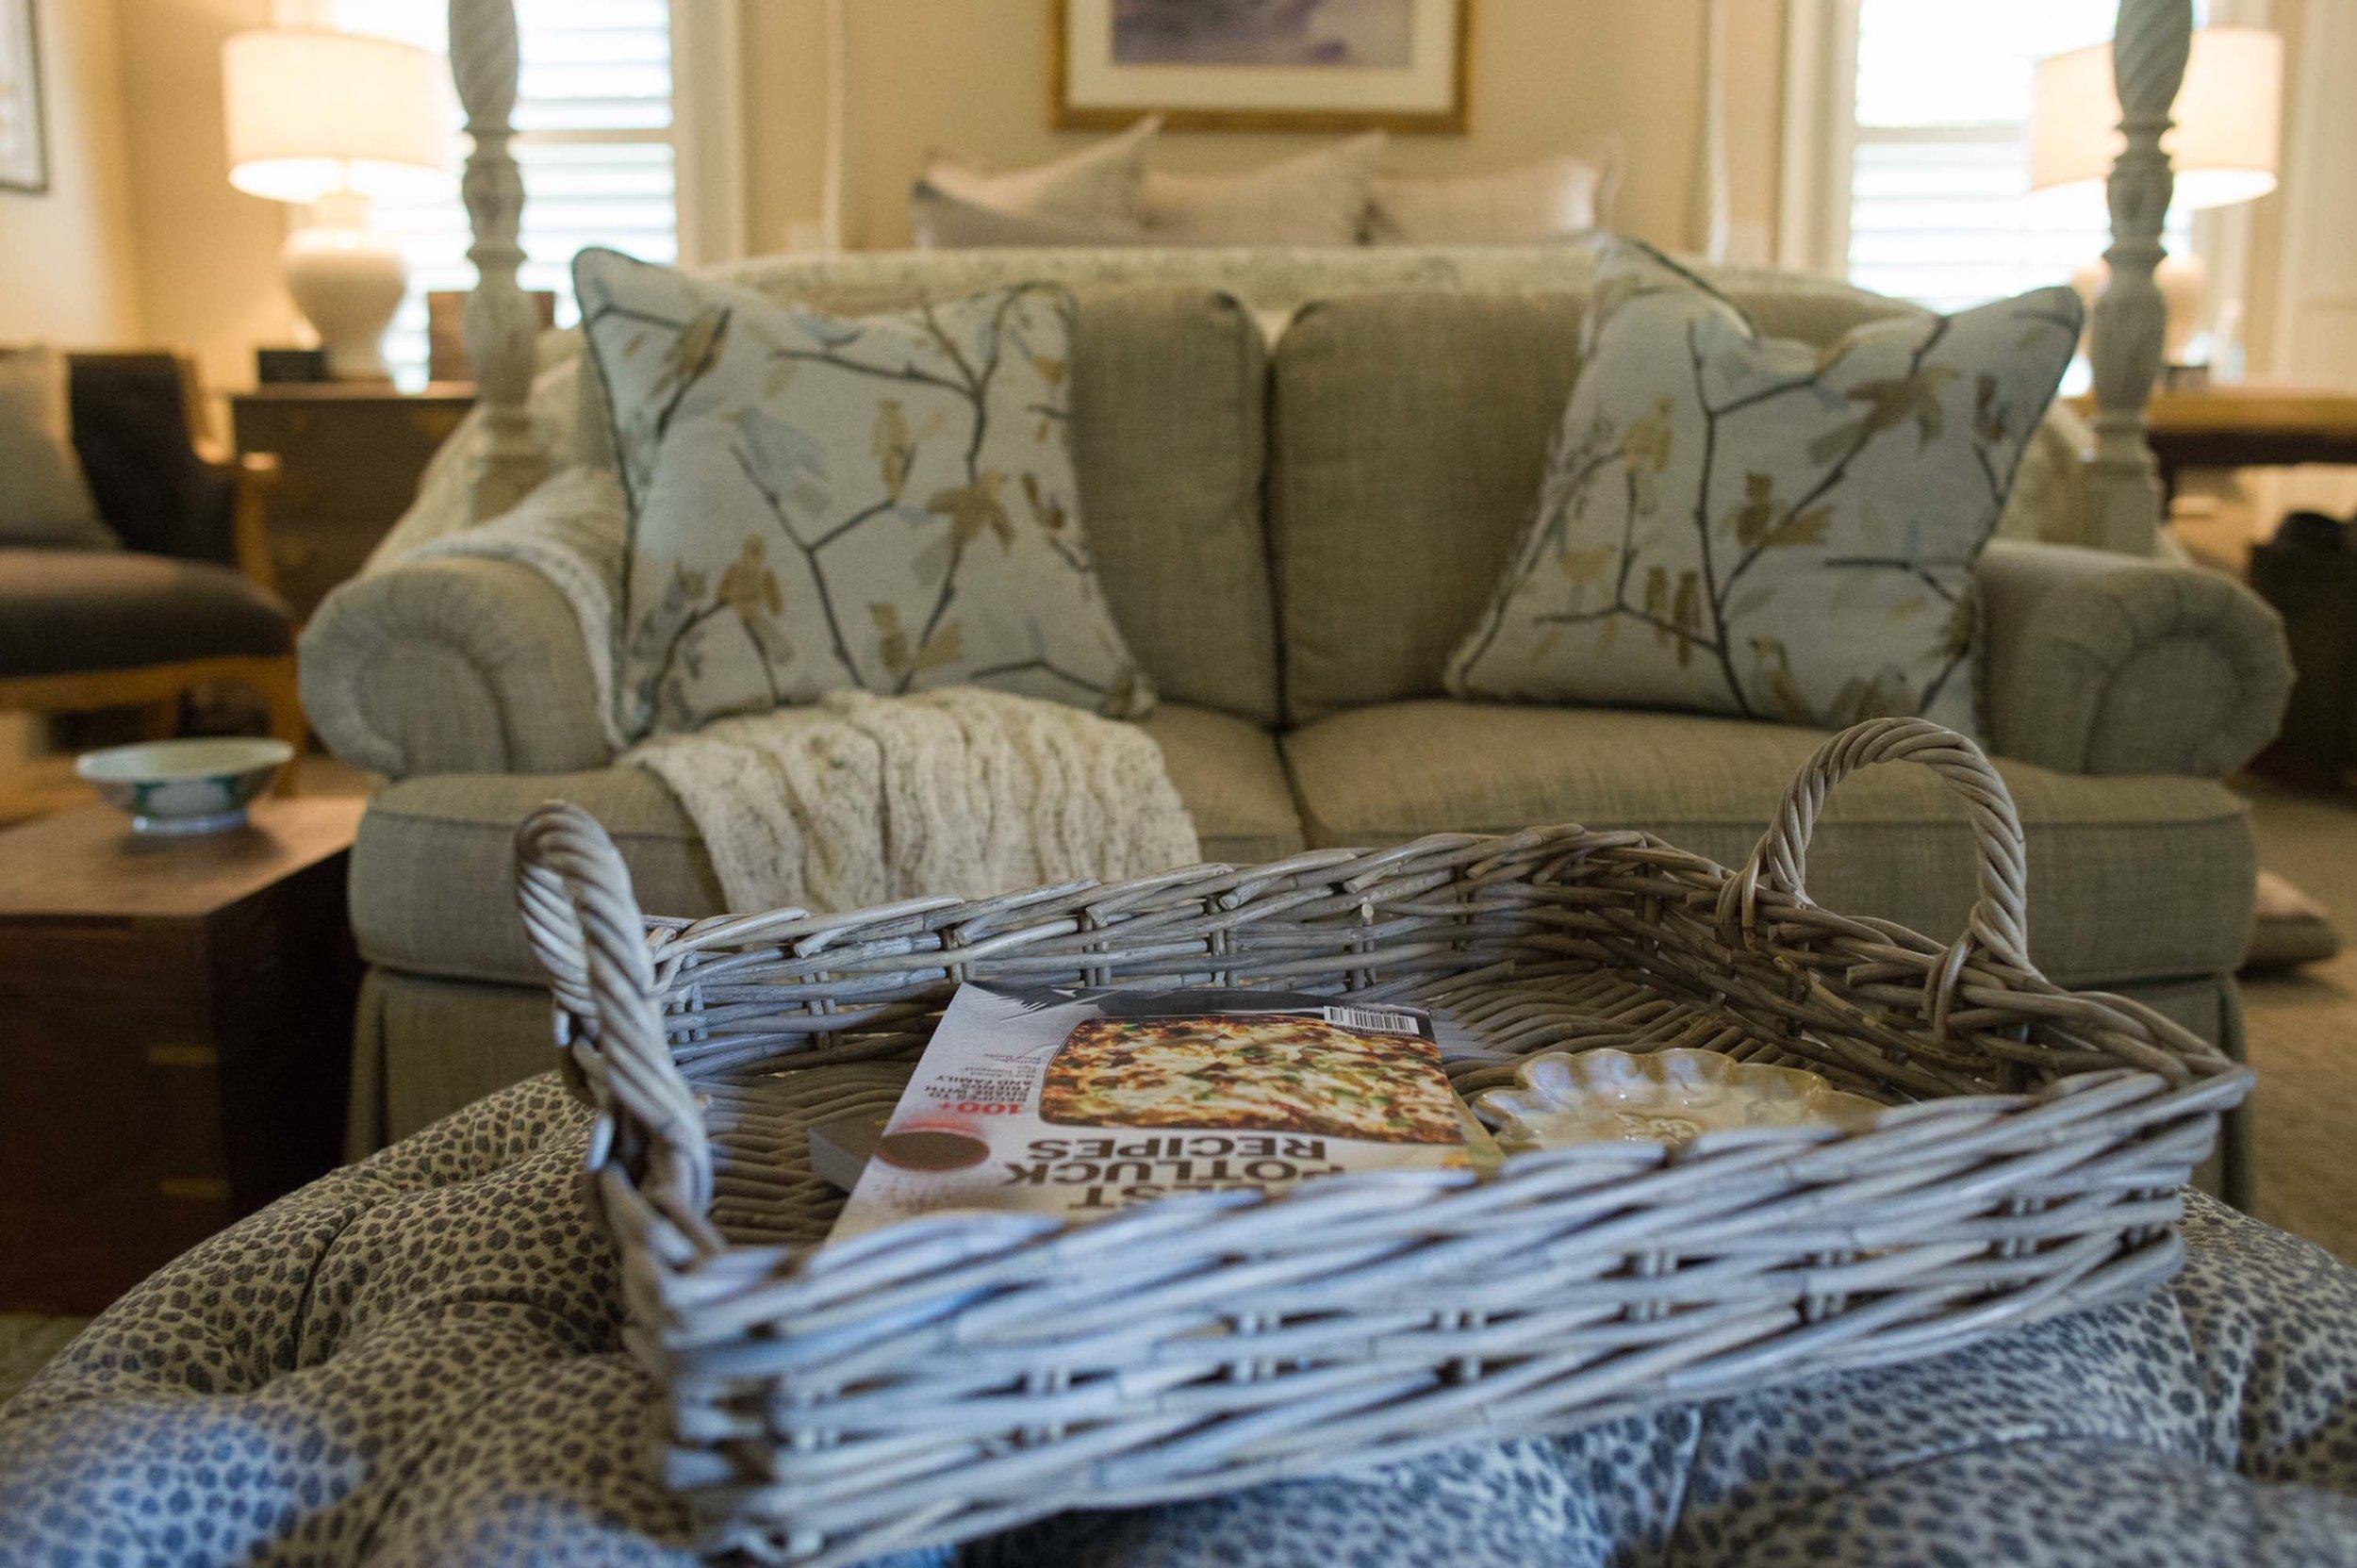 Custom Sherrill Loveseat with Norwalk Pillows and Basket